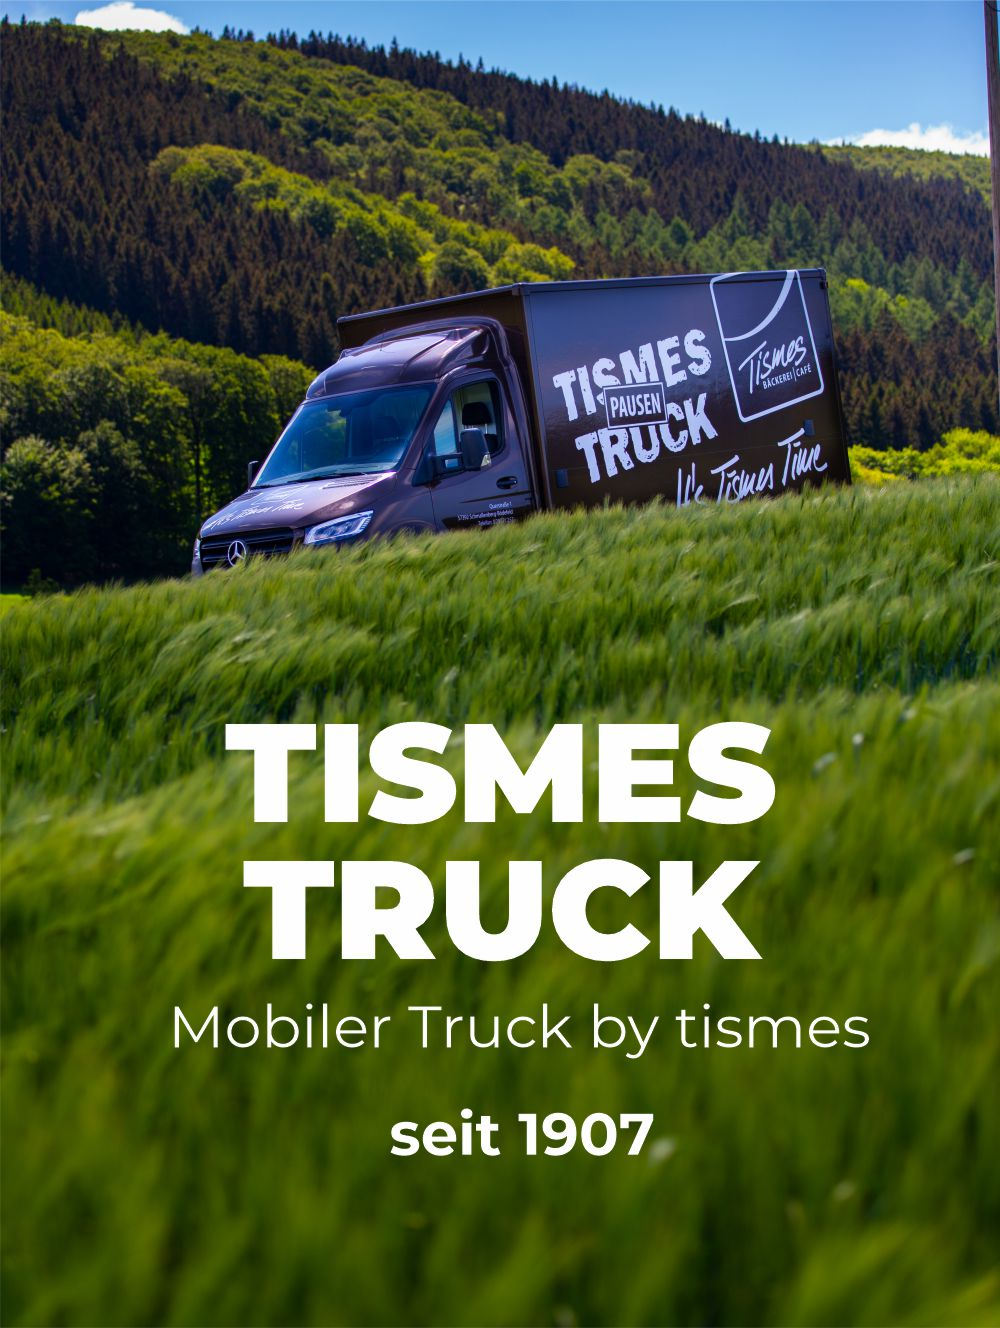 tismes_truck_slider_001_xs